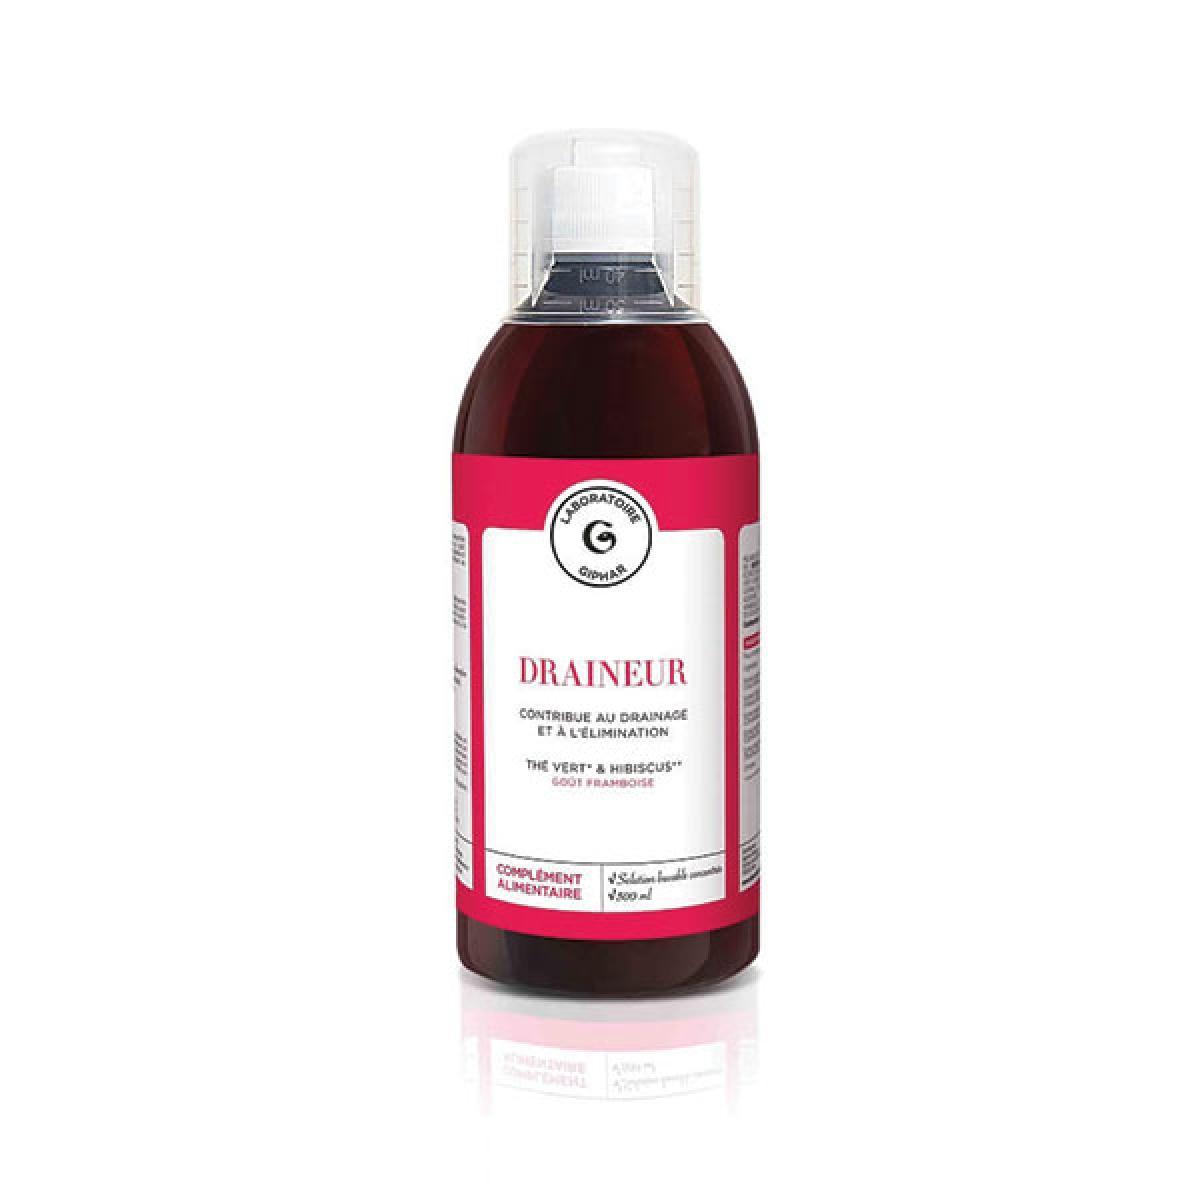 LABORATOIRE GIPHAR Draineur 500ml - Parapharmacie - Pharmarket